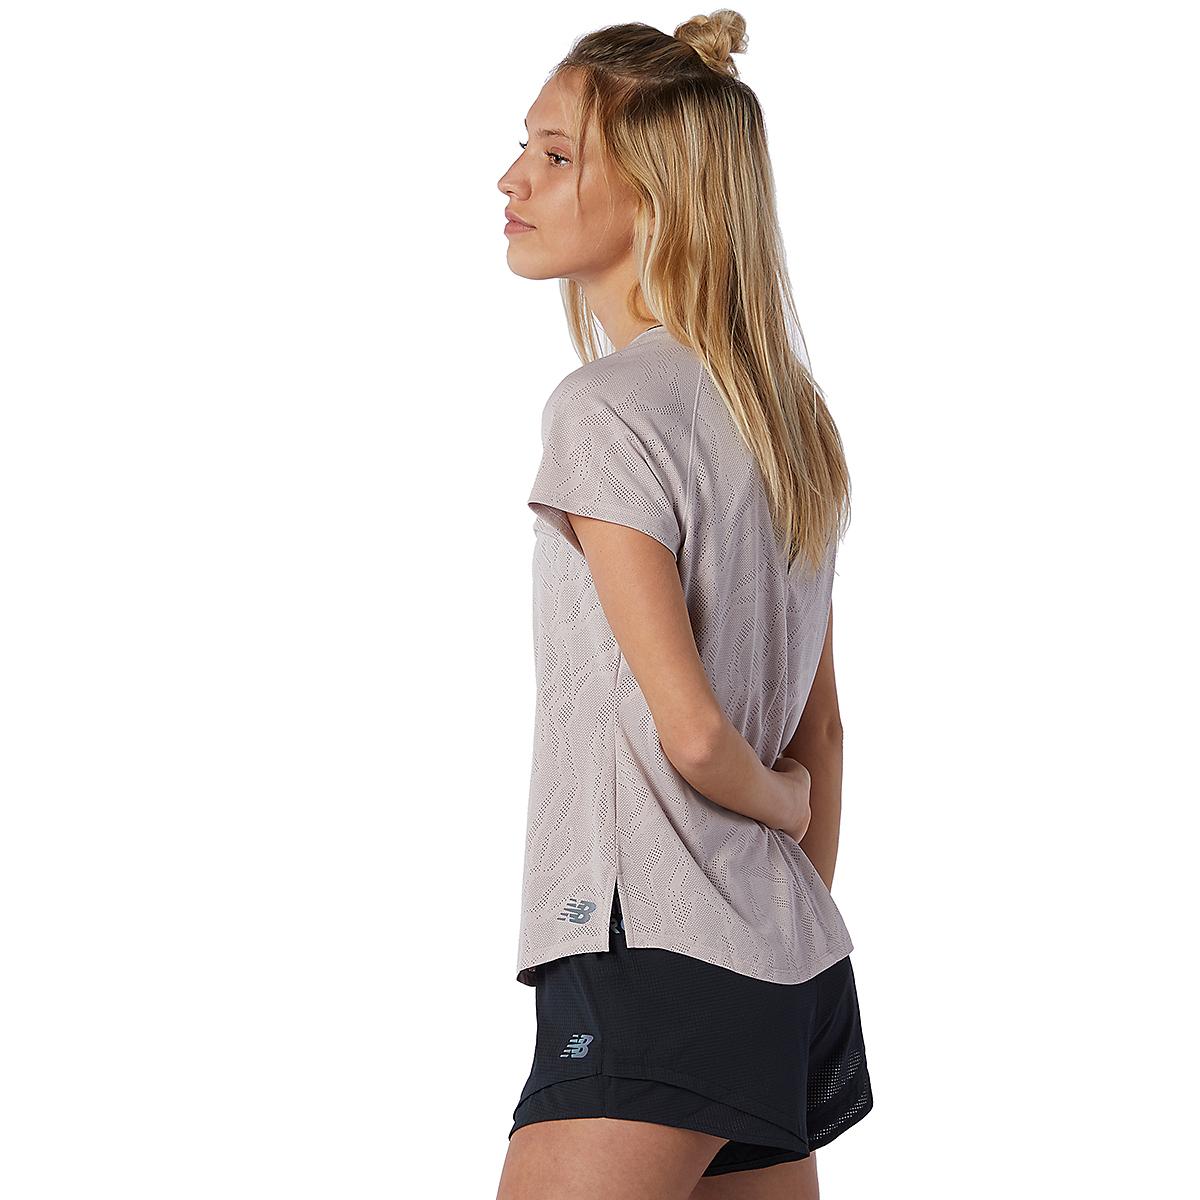 Women's New Balance Q Speed Fuel Jacquard Short Sleeve - Color: Logwood - Size: XS, Logwood, large, image 3